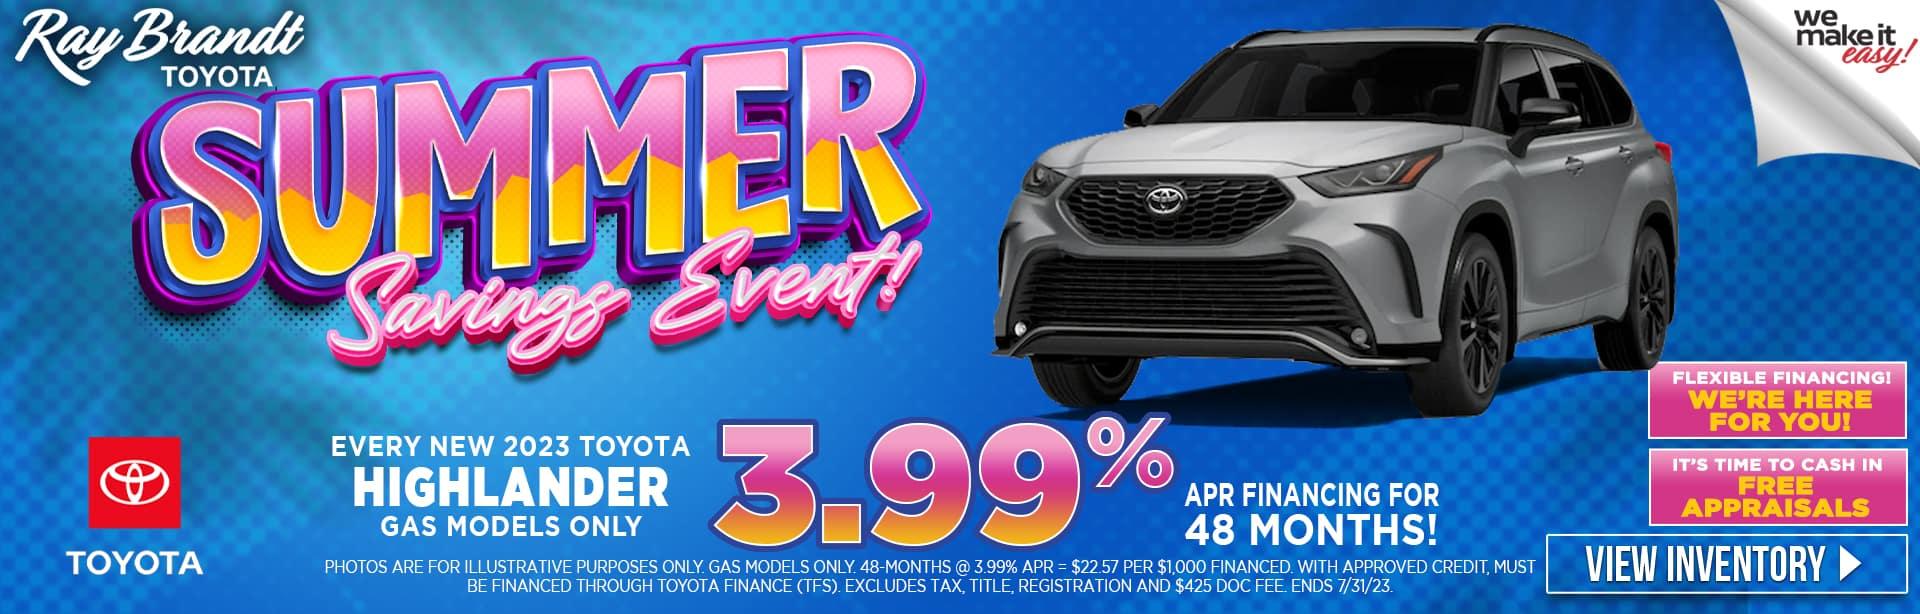 NEW 2021 Toyota Highlander in Stock